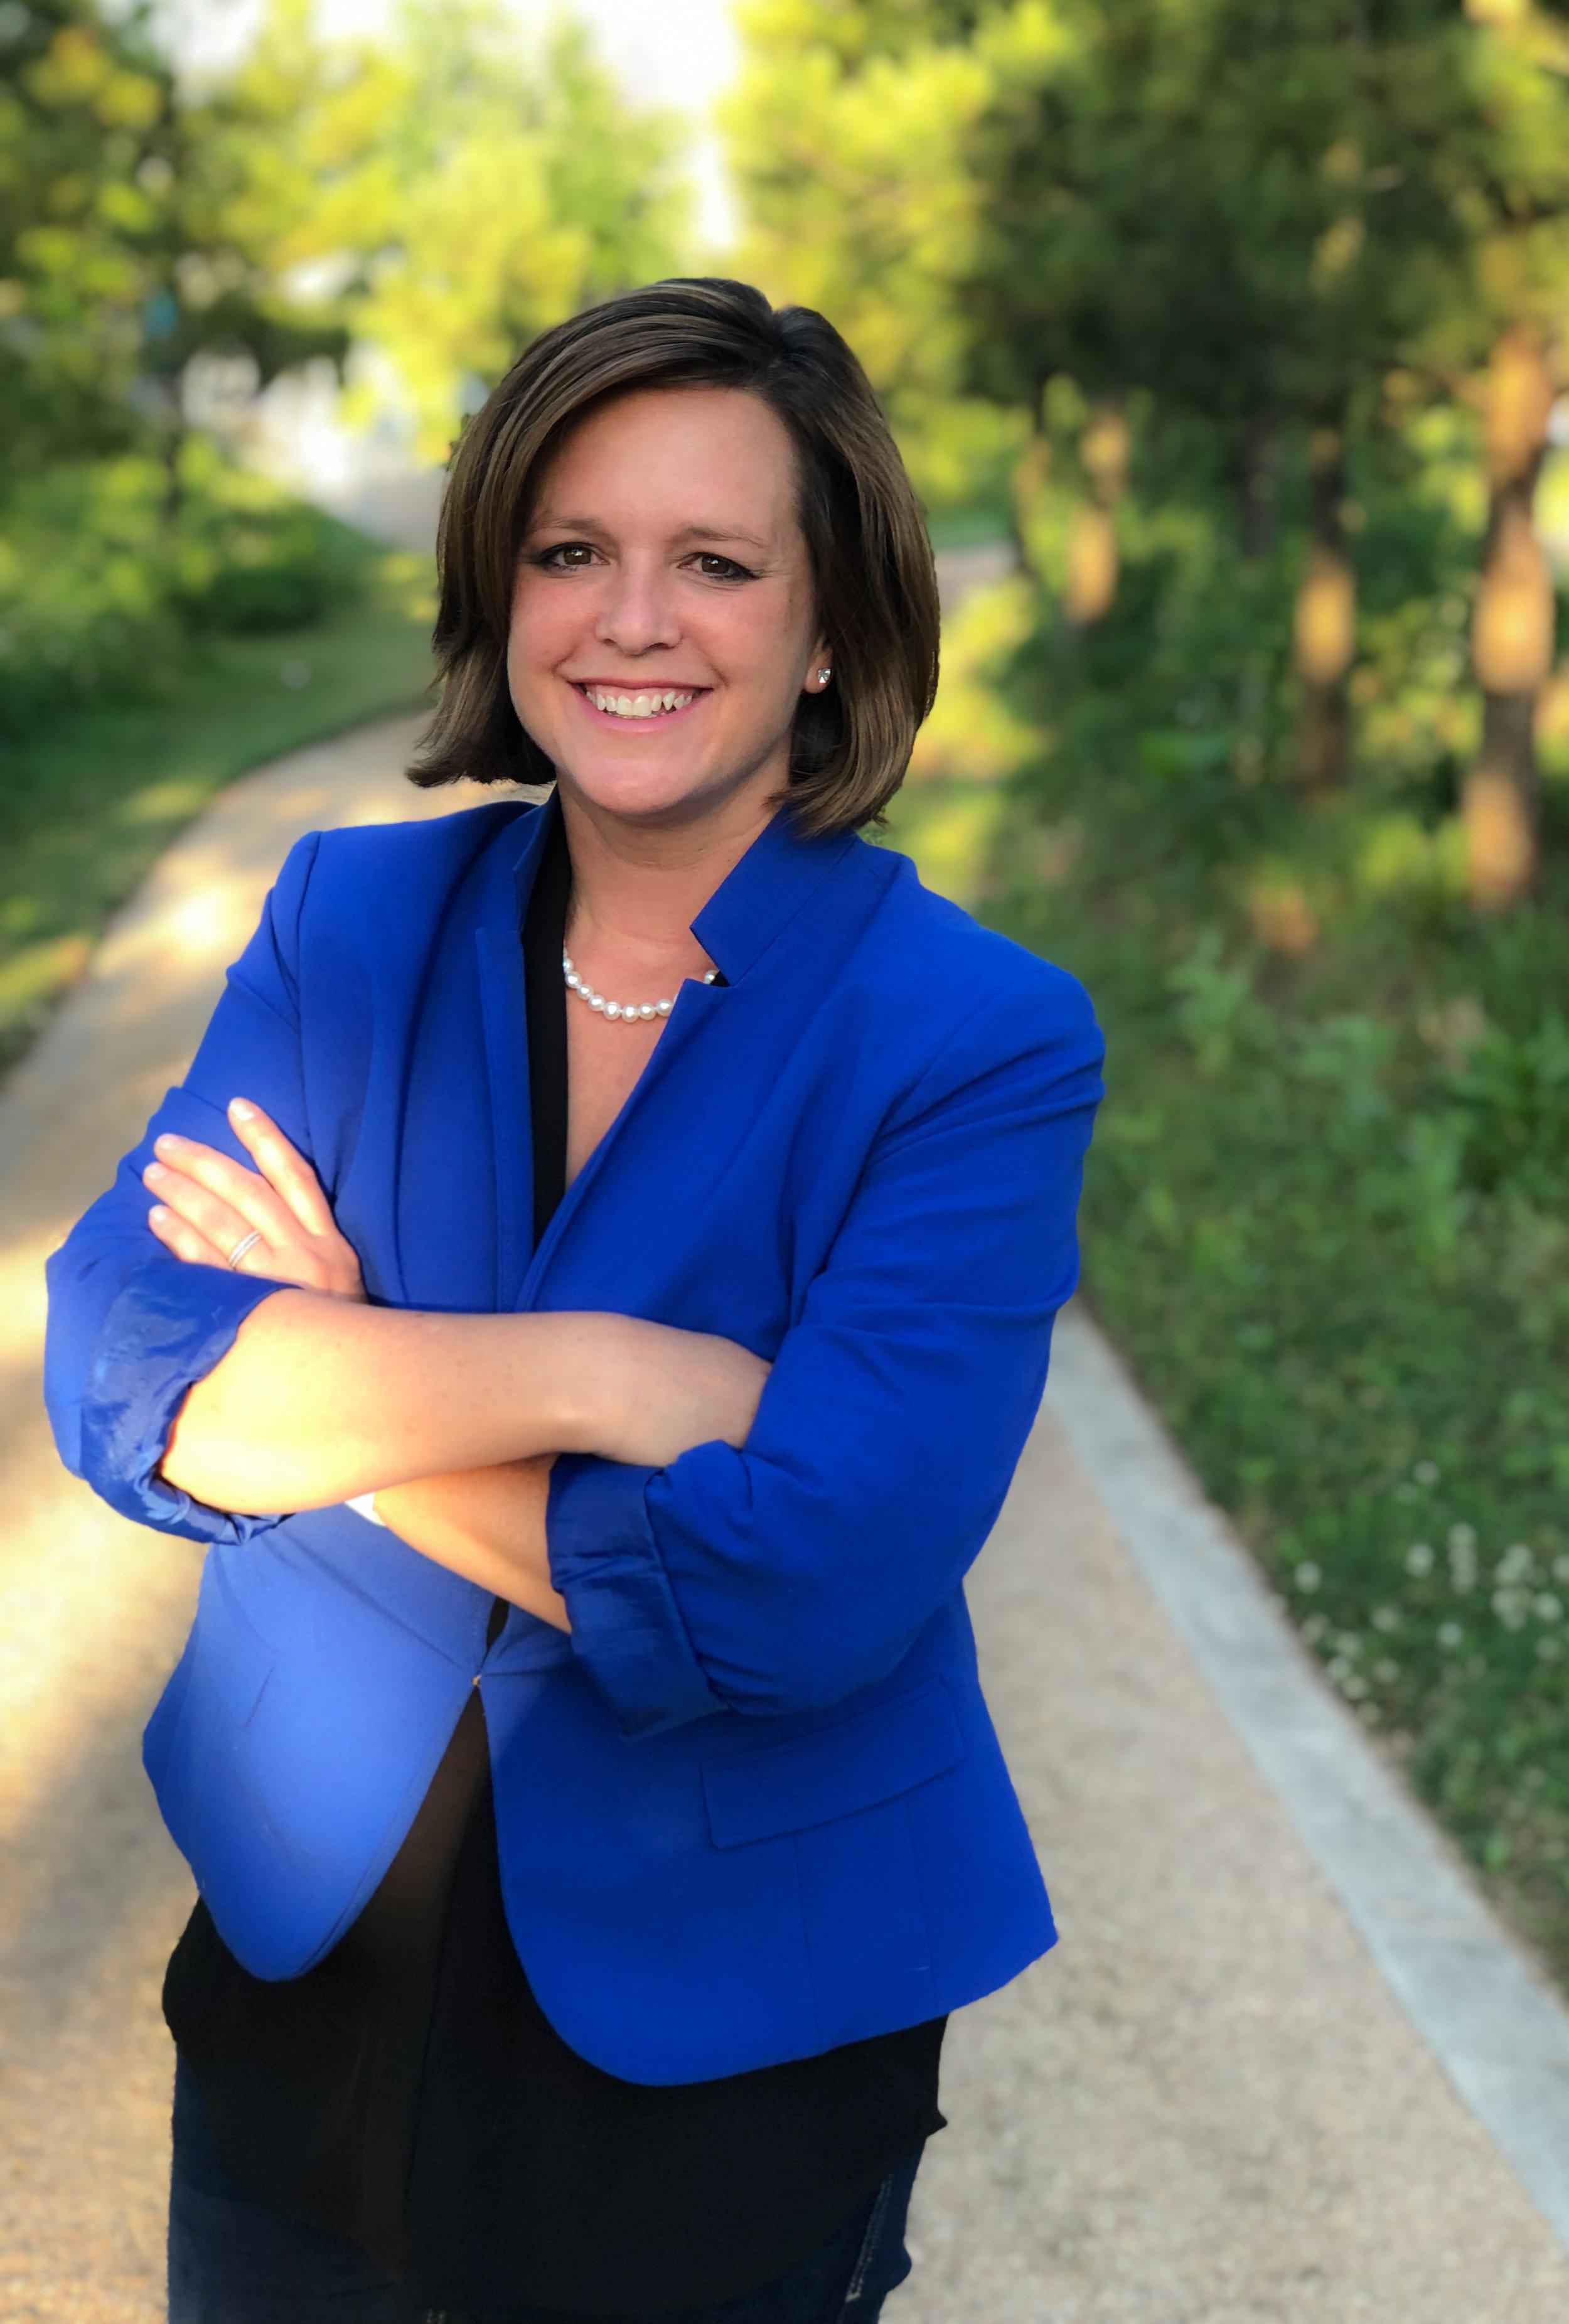 Ann Johnson will fight for a stronger Texas.